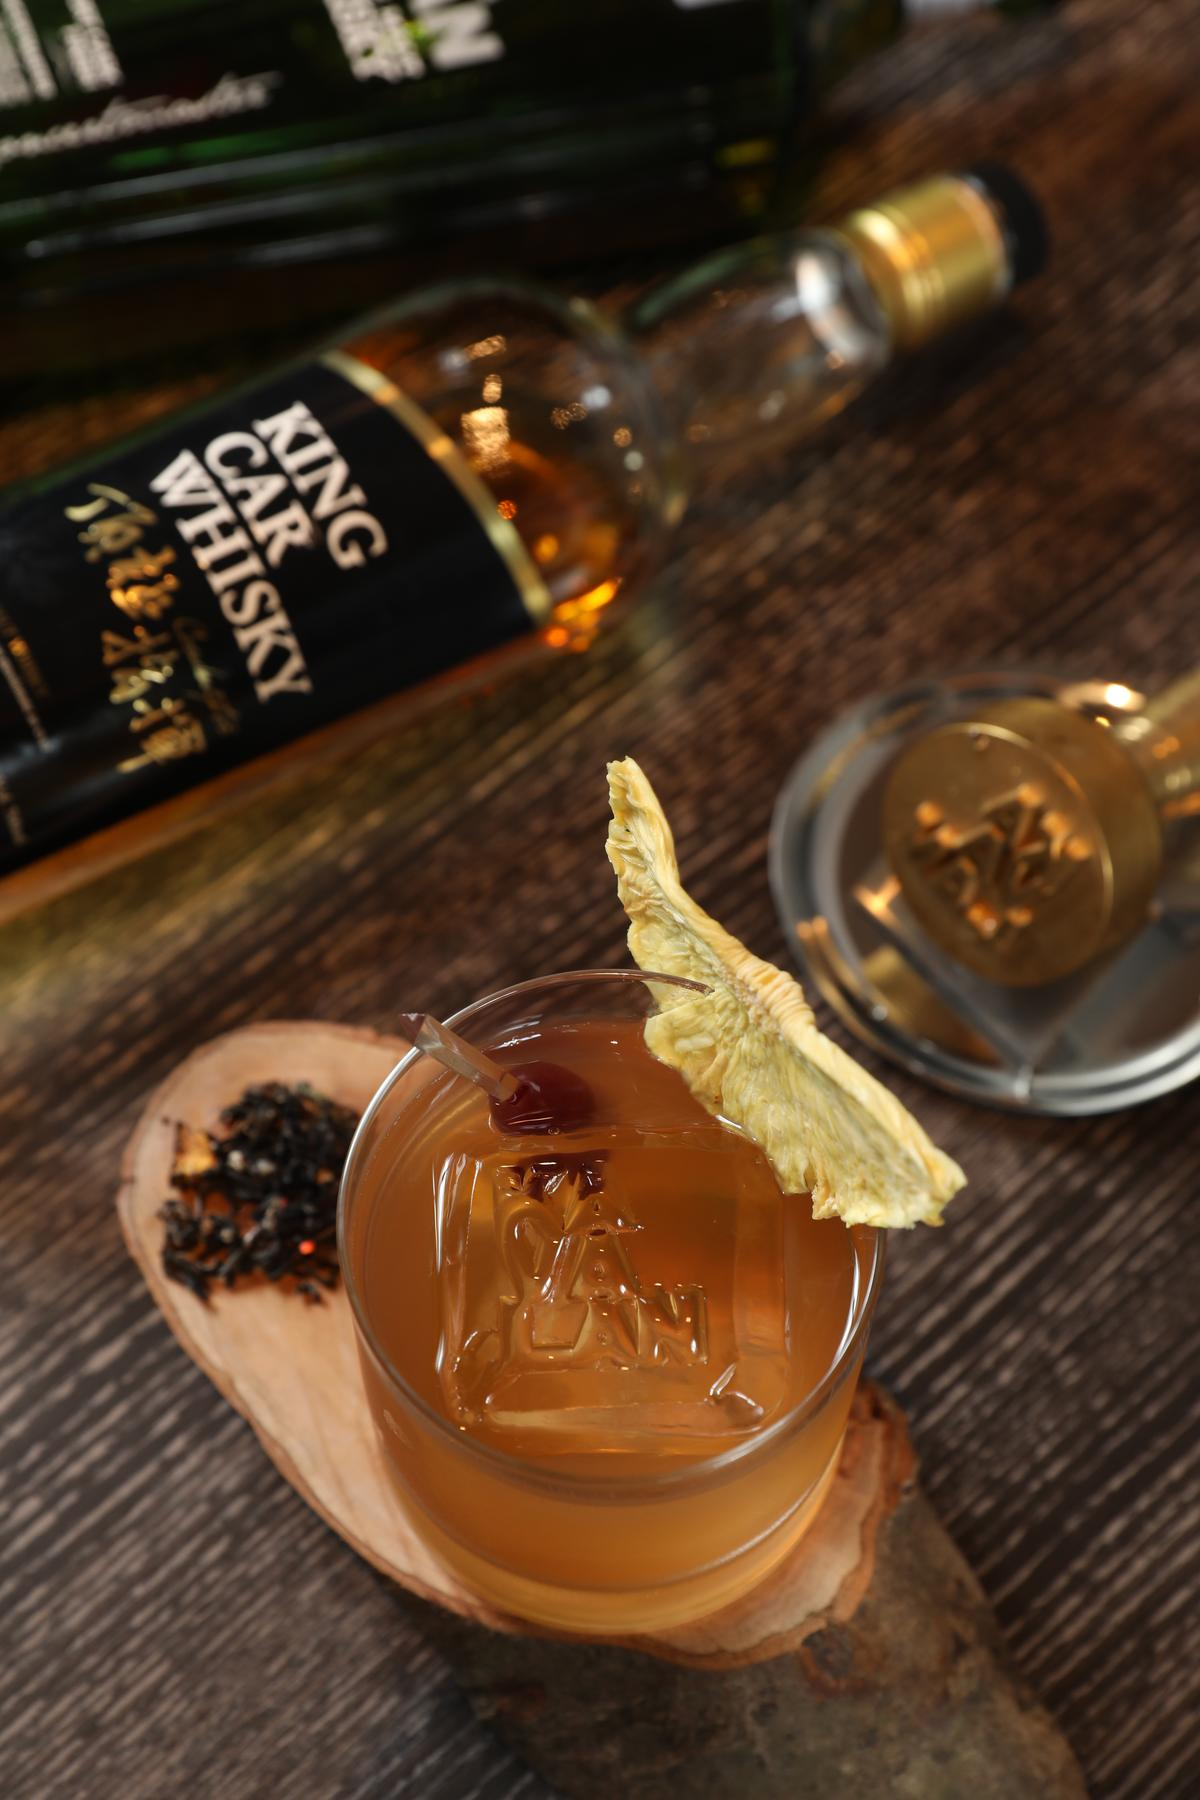 Mu Bar選用「金車噶瑪蘭」威士忌為基酒推出的限定特調,Mu Fashioned為限定款中的招牌。